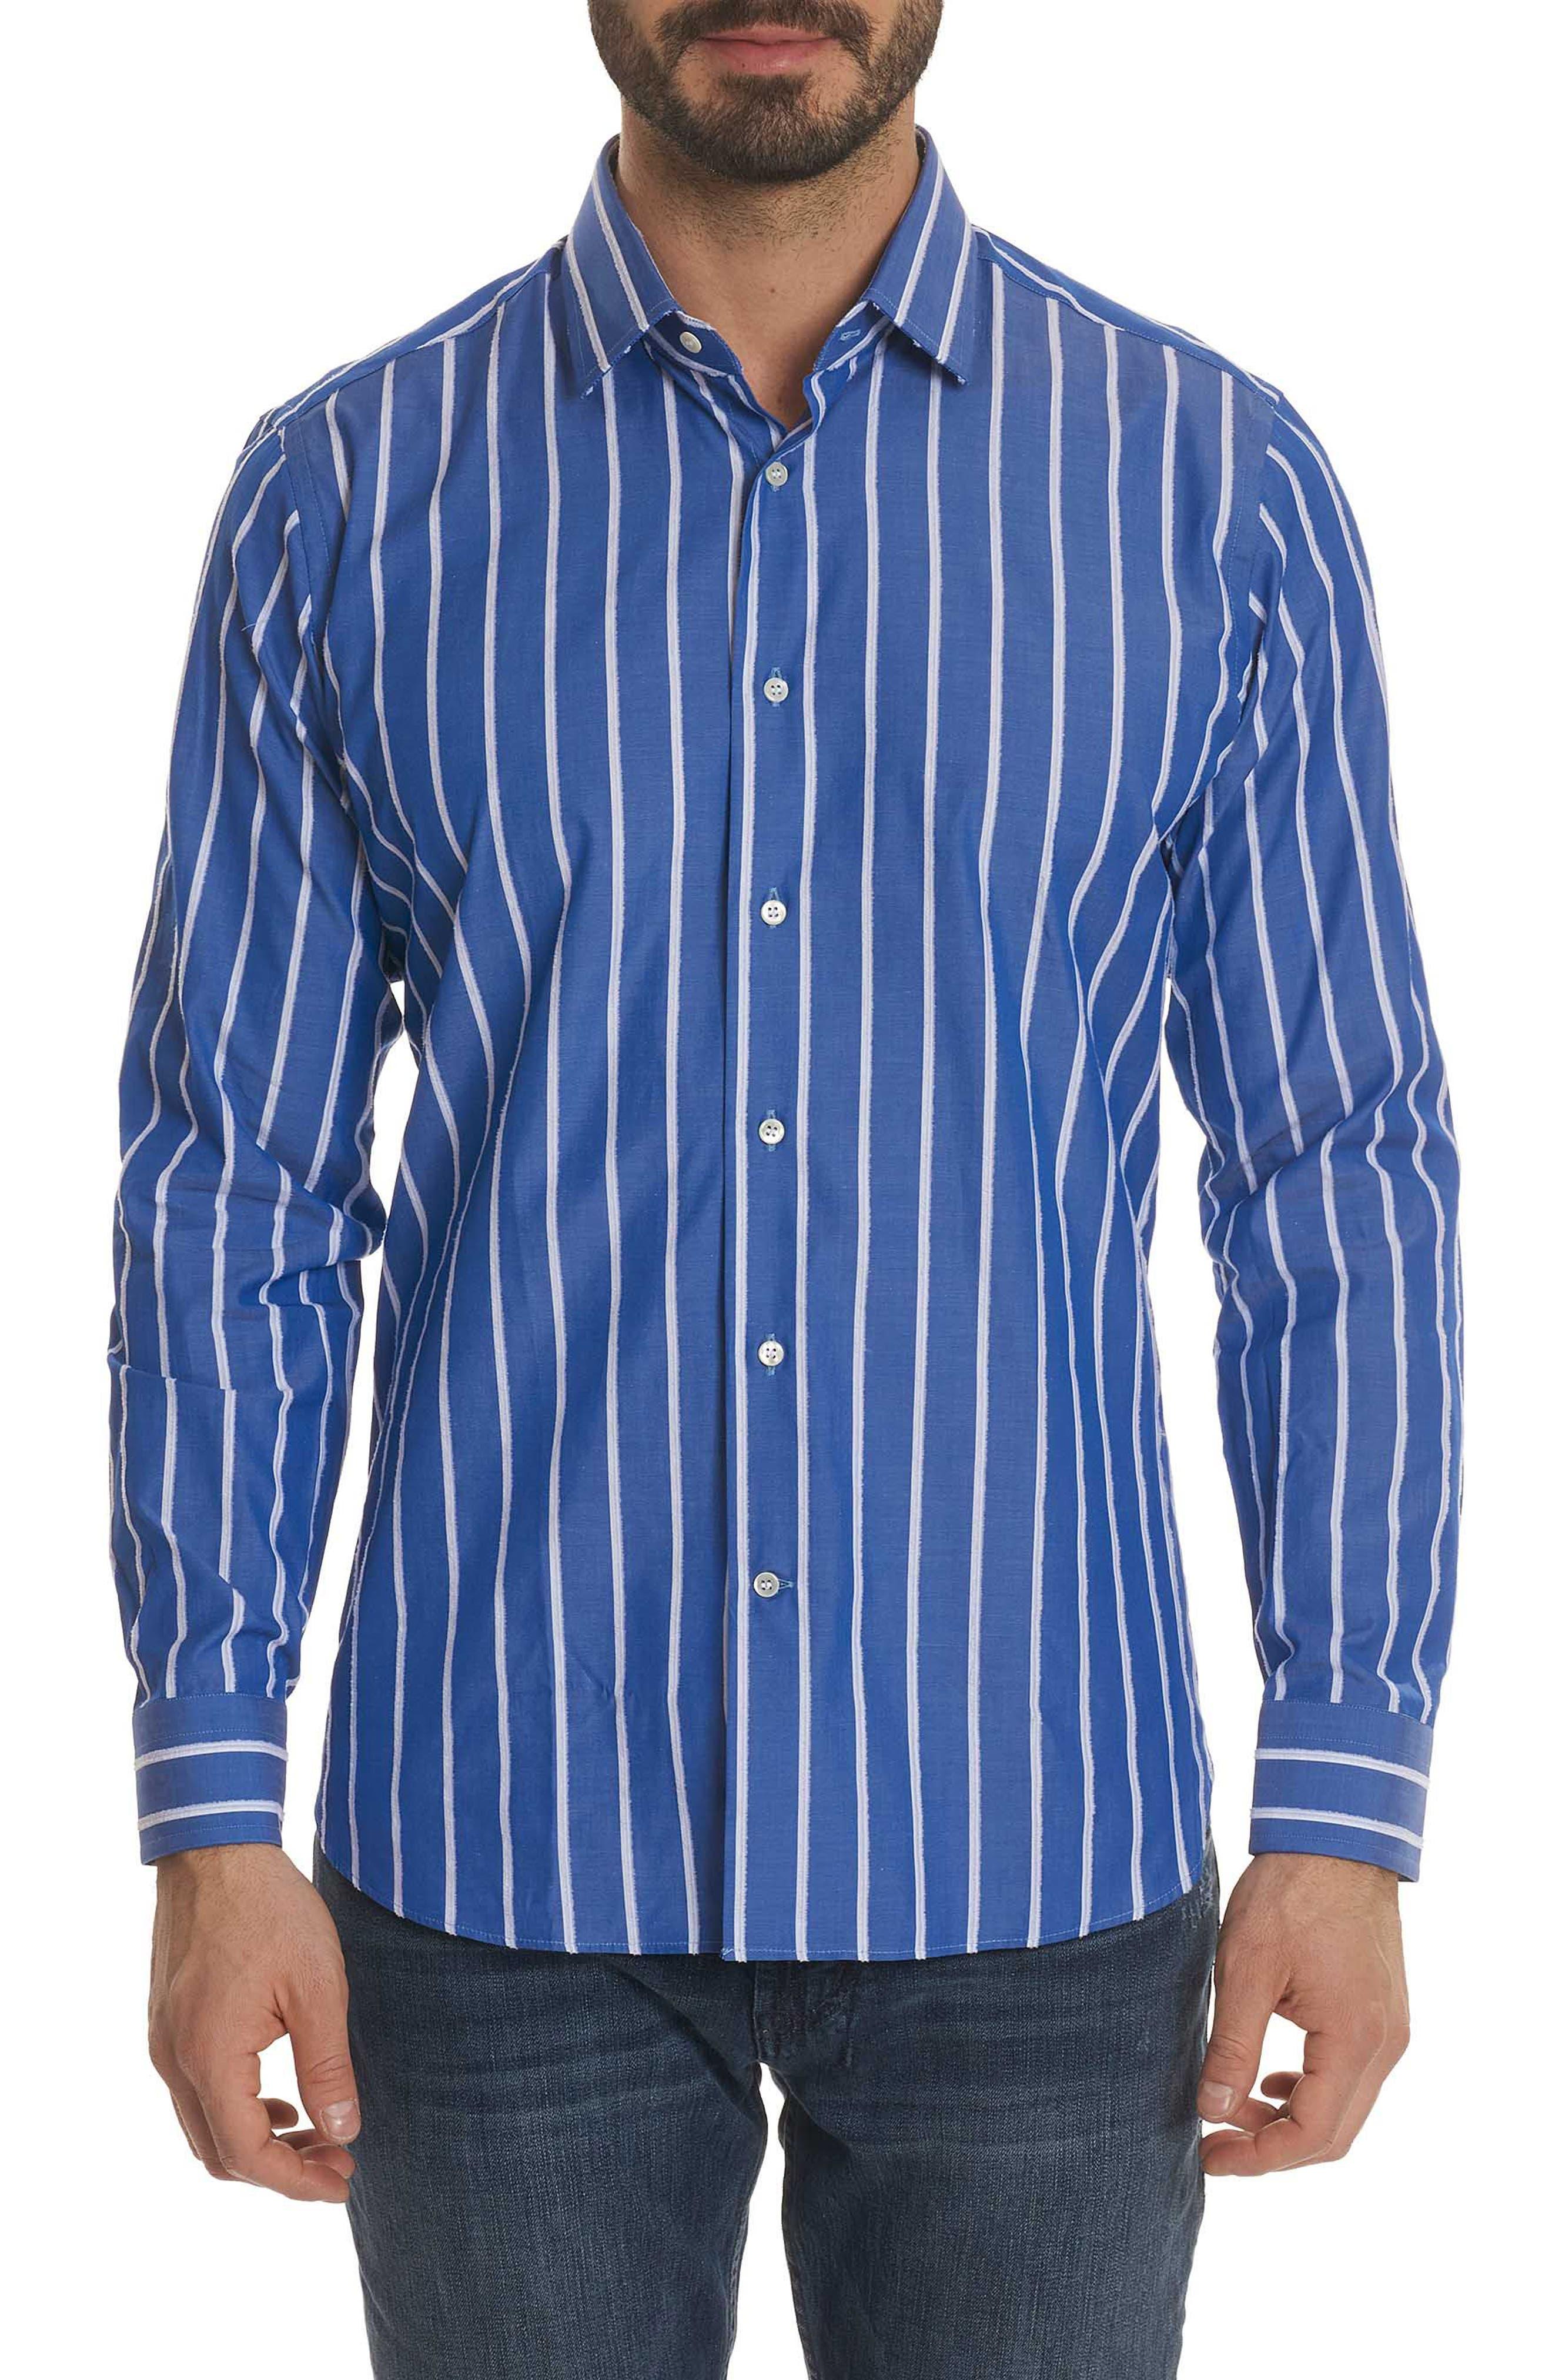 Massimo Regular Fit Stripe Sport Shirt,                         Main,                         color, 400